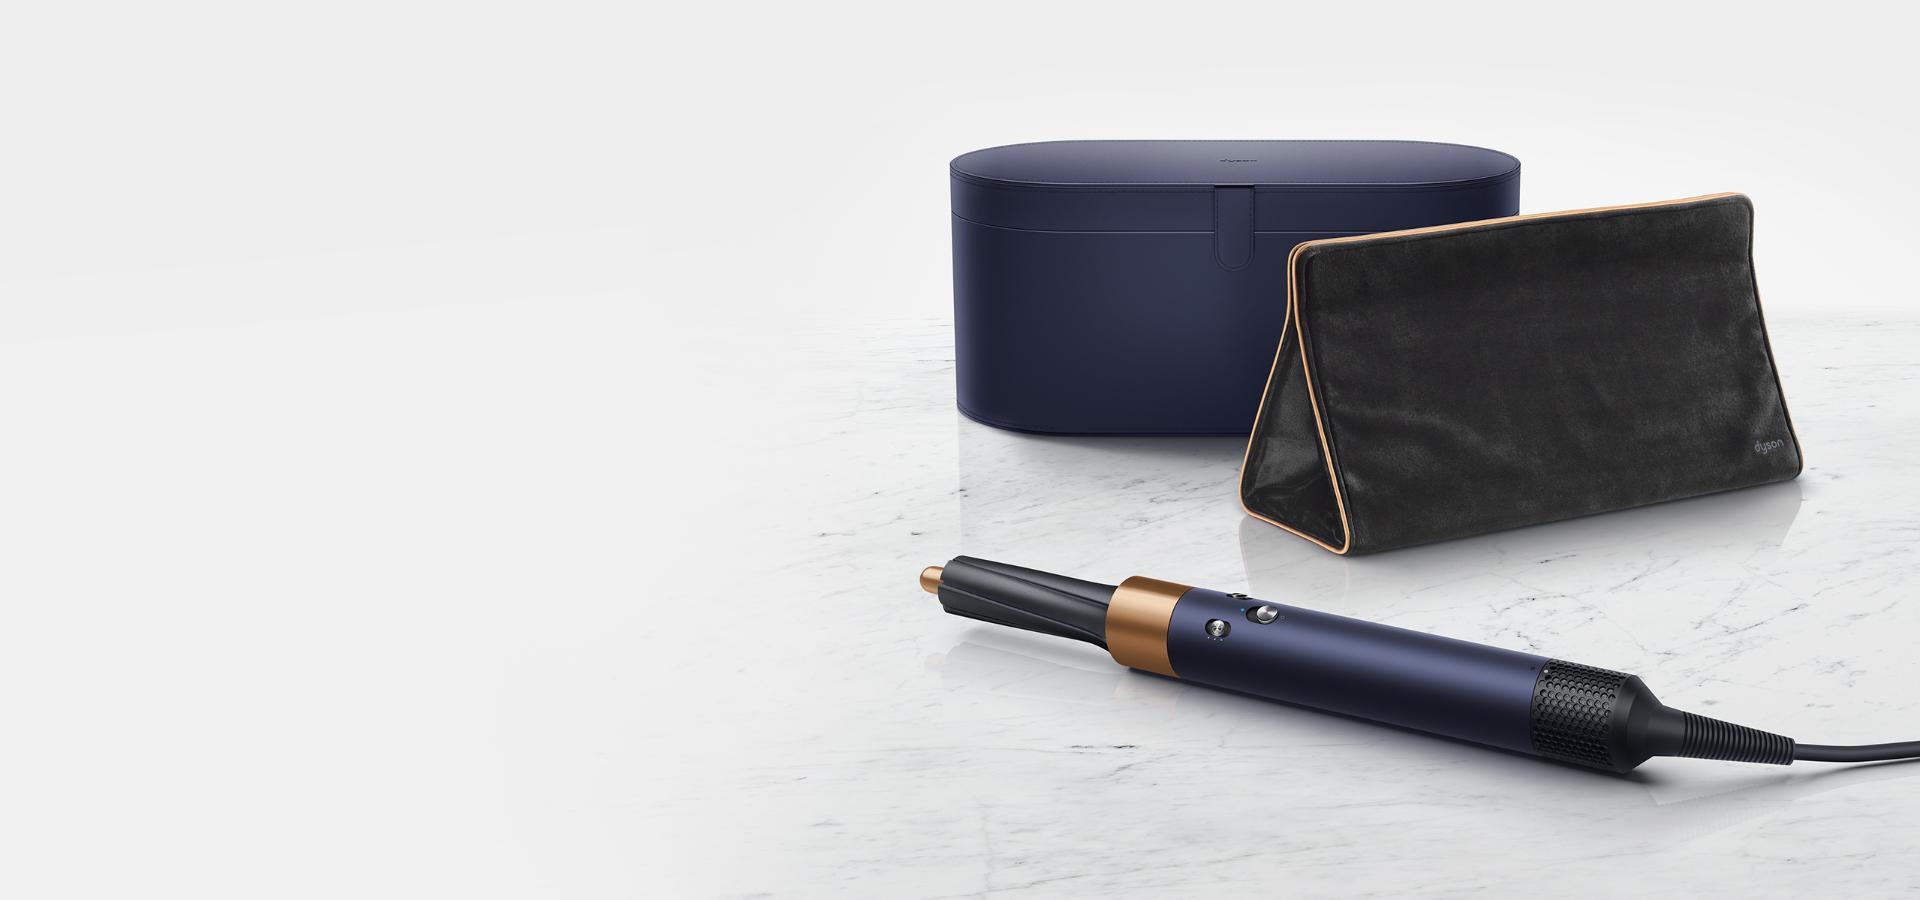 New festive gift edition Dyson Airwrap™ styler